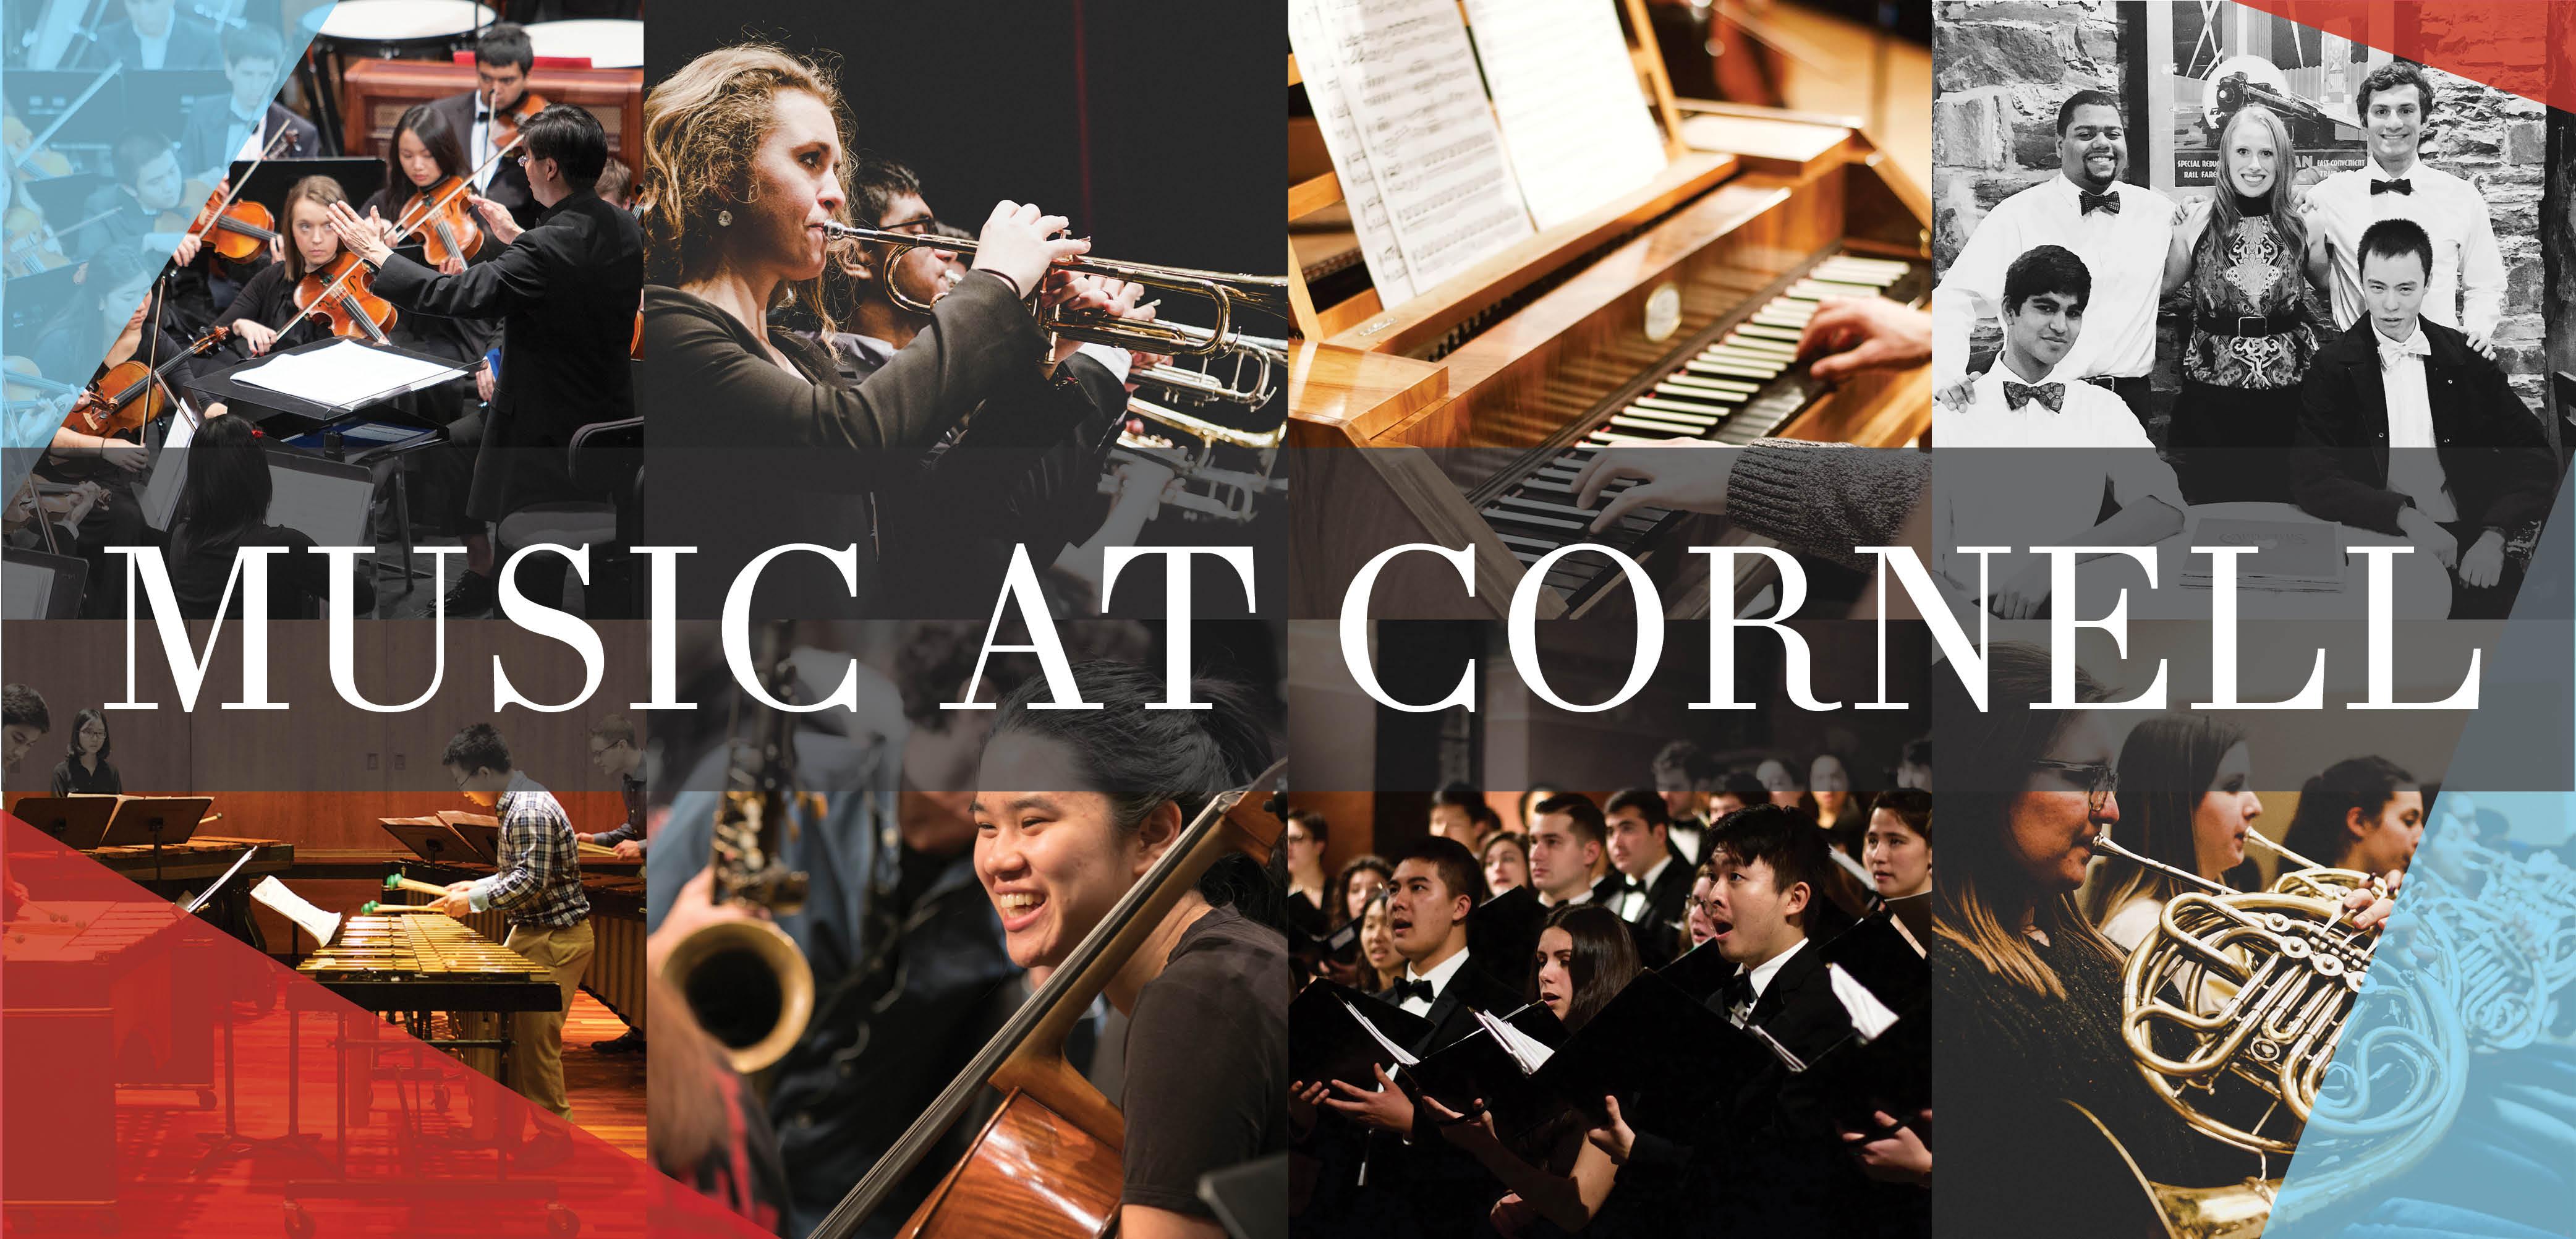 Music at Cornell